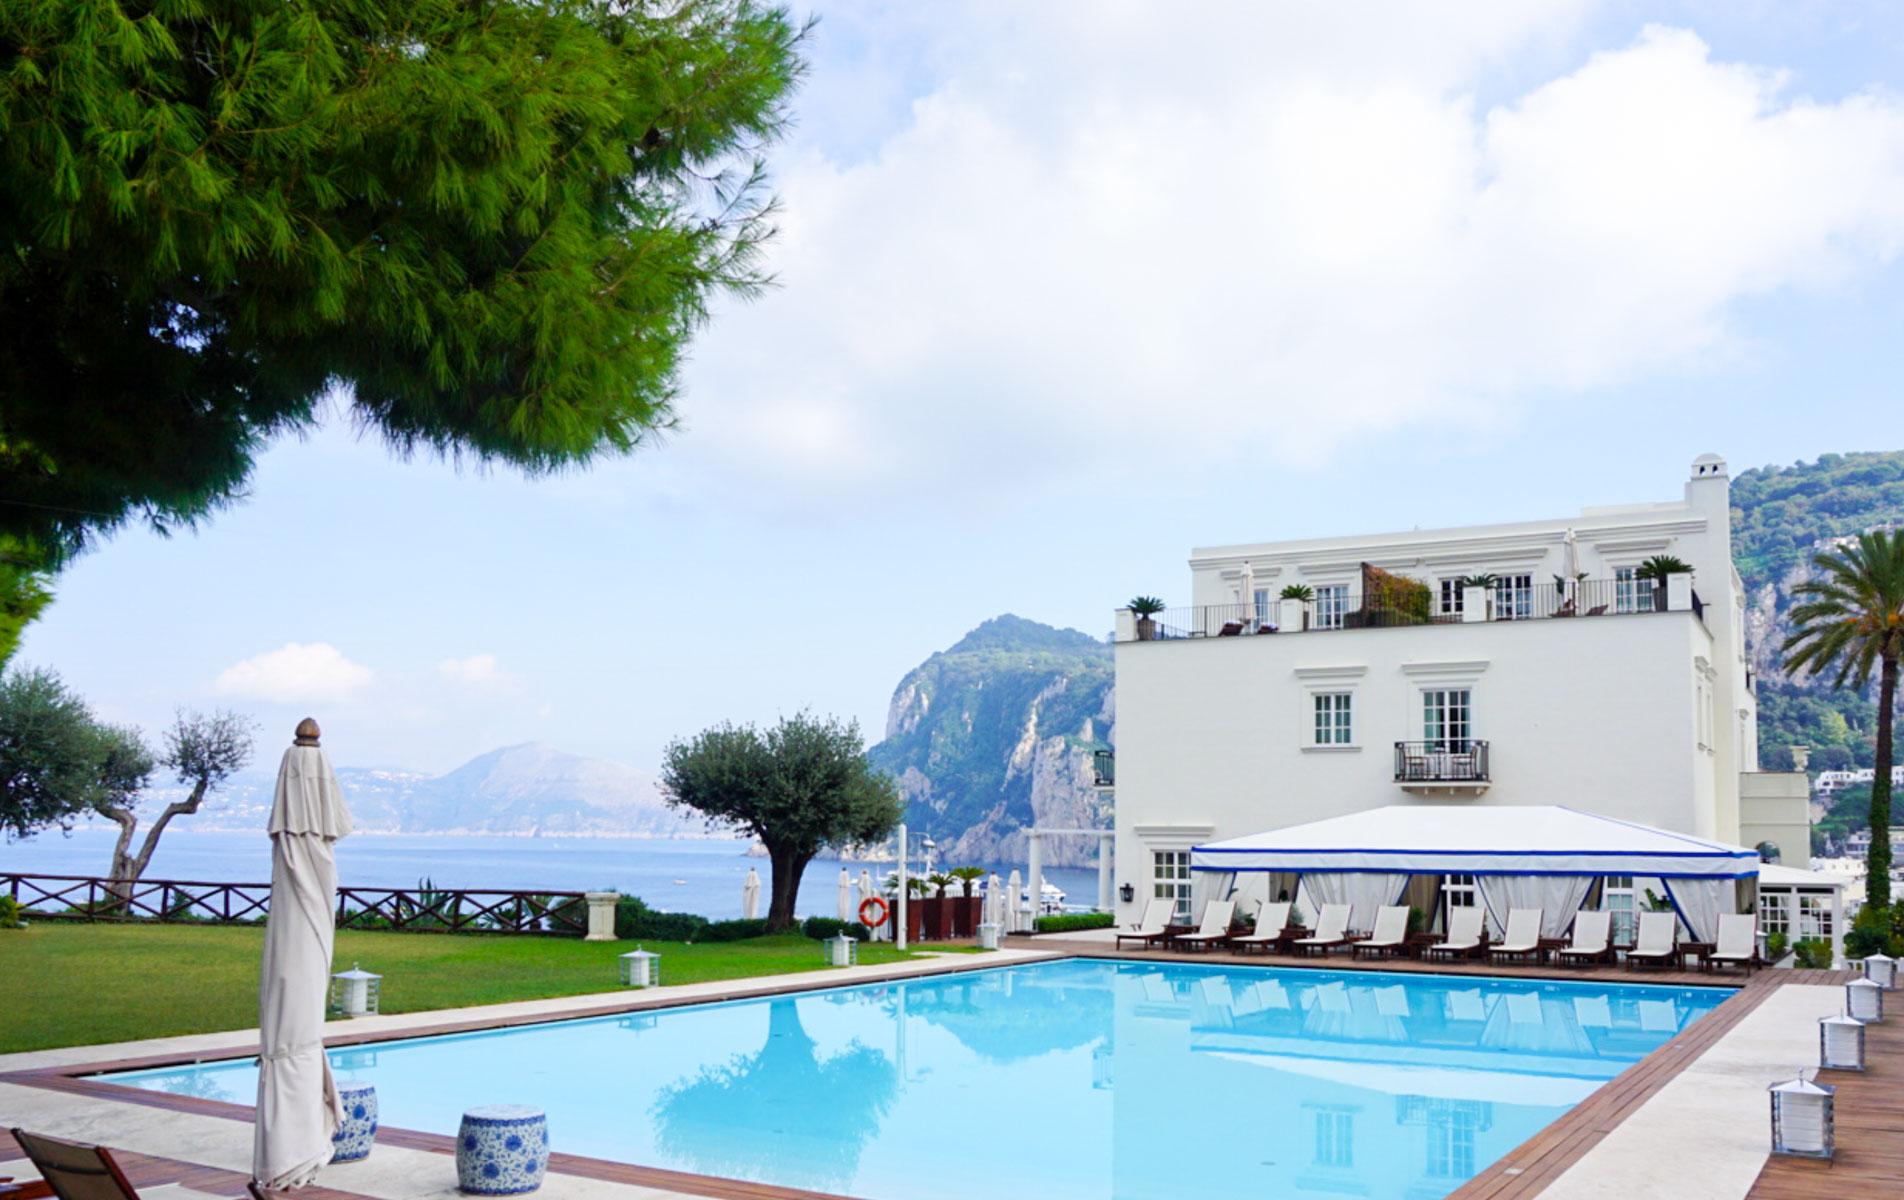 J.K. Place Capri  Pool. One of the best views in Capri.